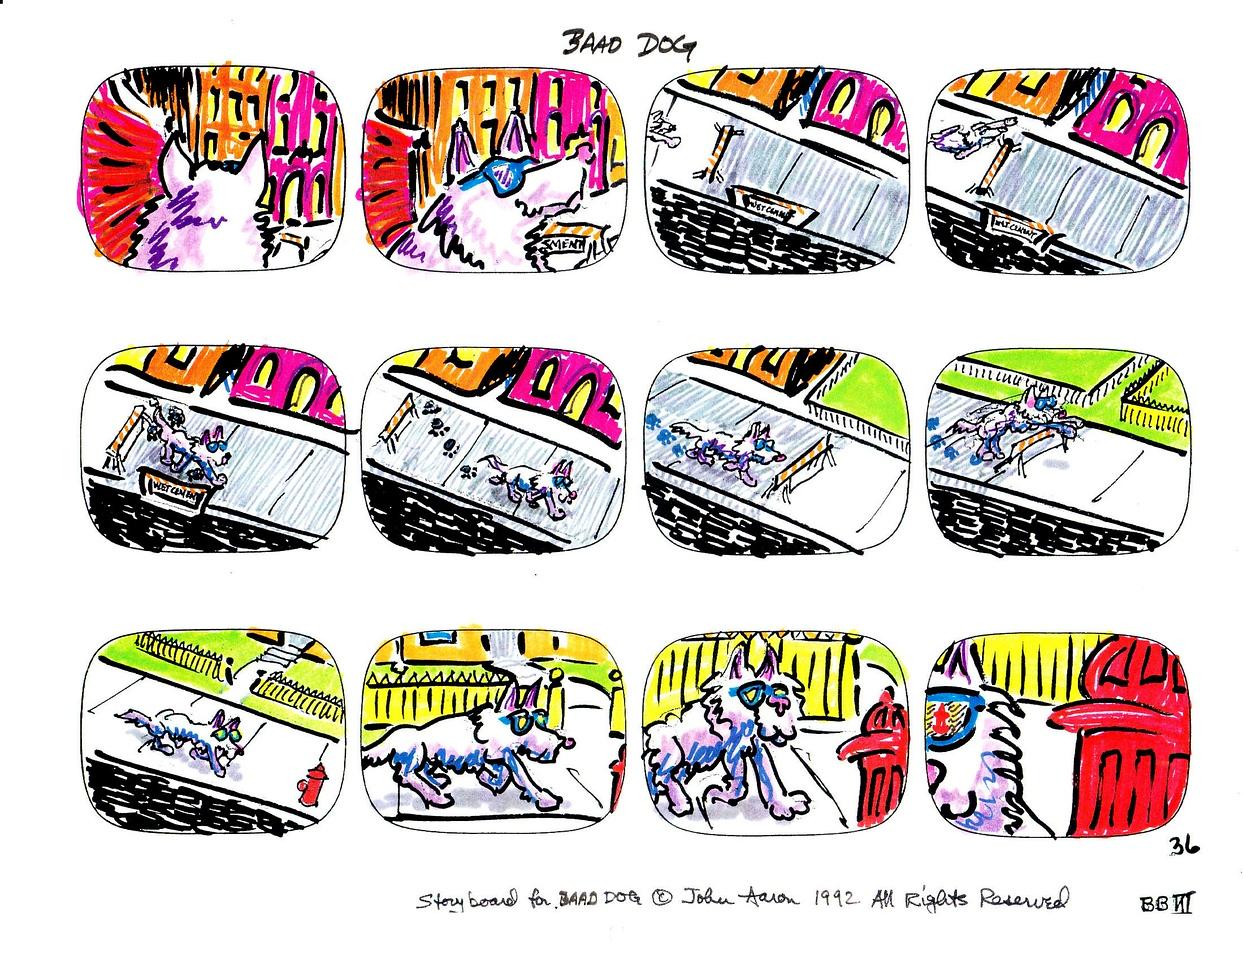 """BAAD DOG"" ANIMATED SERIES STORYBOARDS- FULL COLOR JOHN AARON- ARTIST & CREATOR Designed for MODERN ARF ENTERTAINMENT"